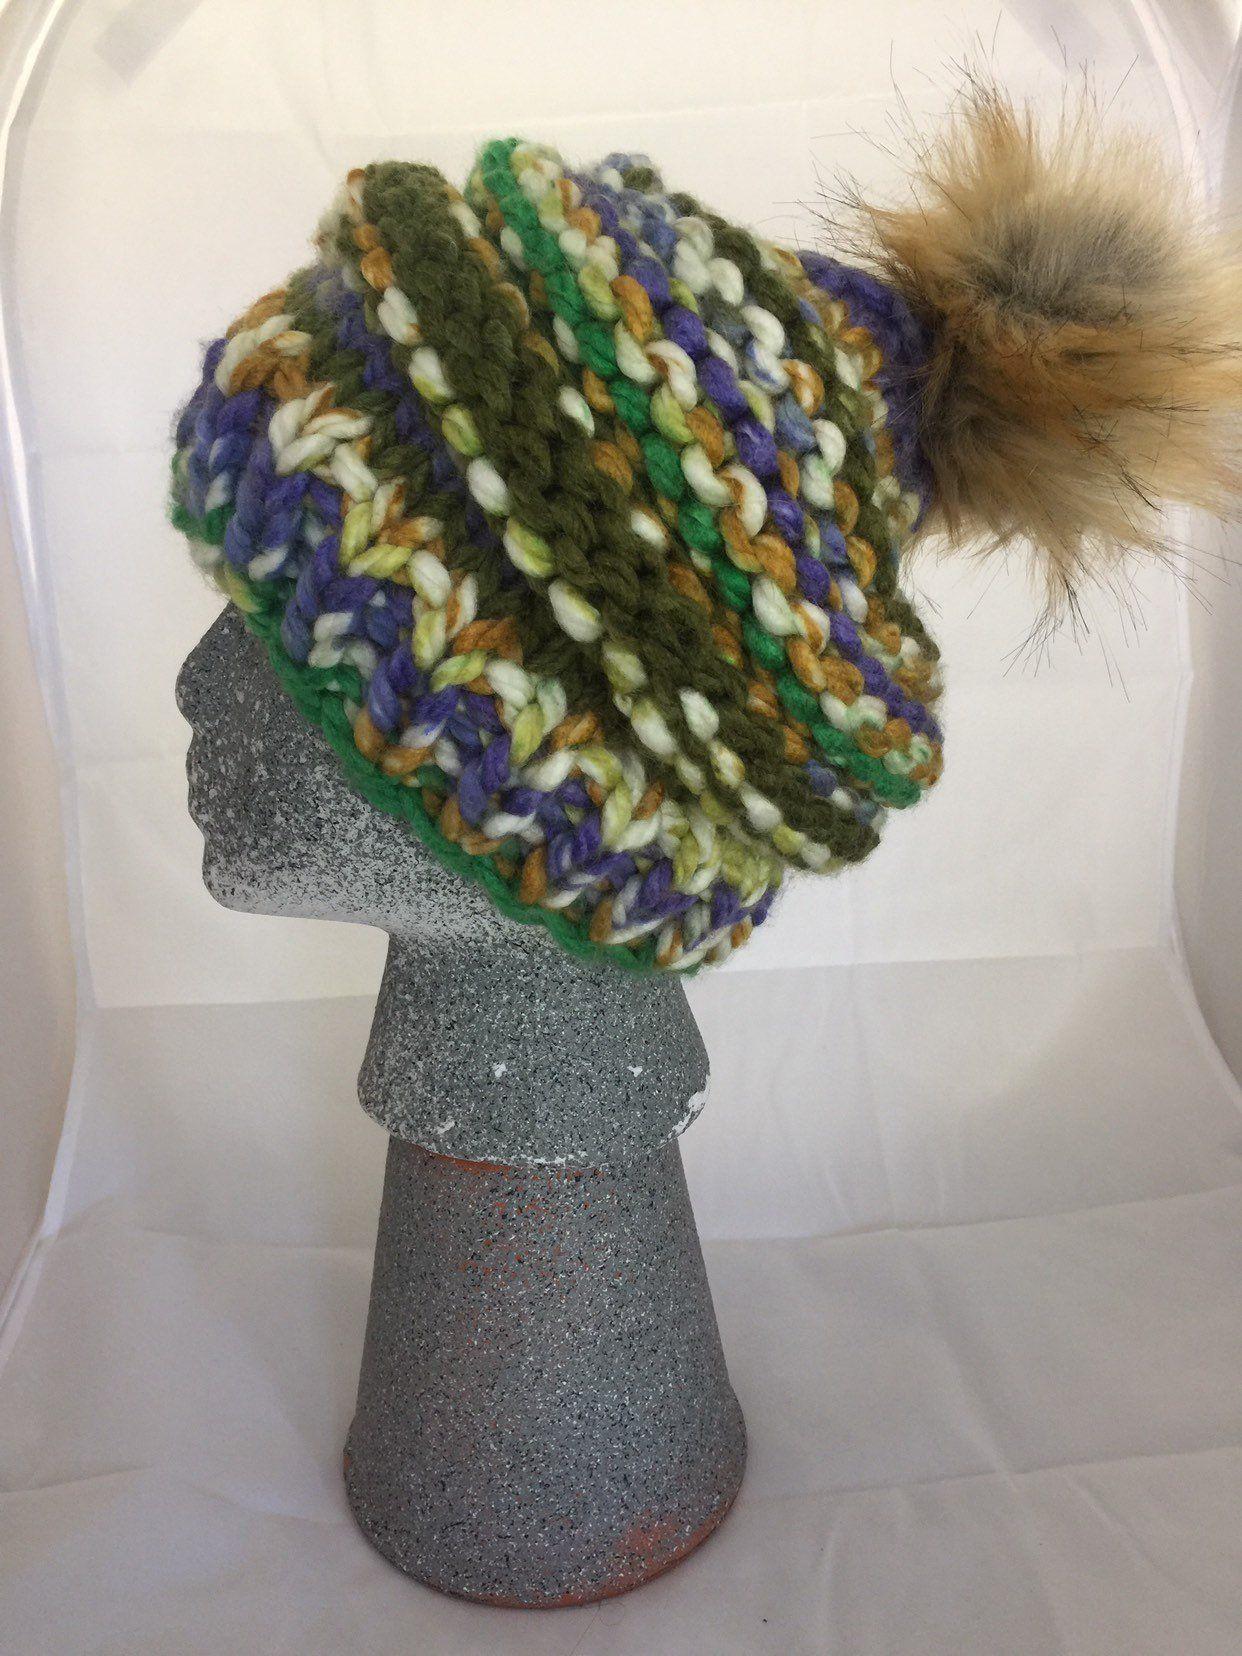 0866ef62031  26.95 Multicolored Wool Pom-pom Beanie by KijaKnits on Etsy